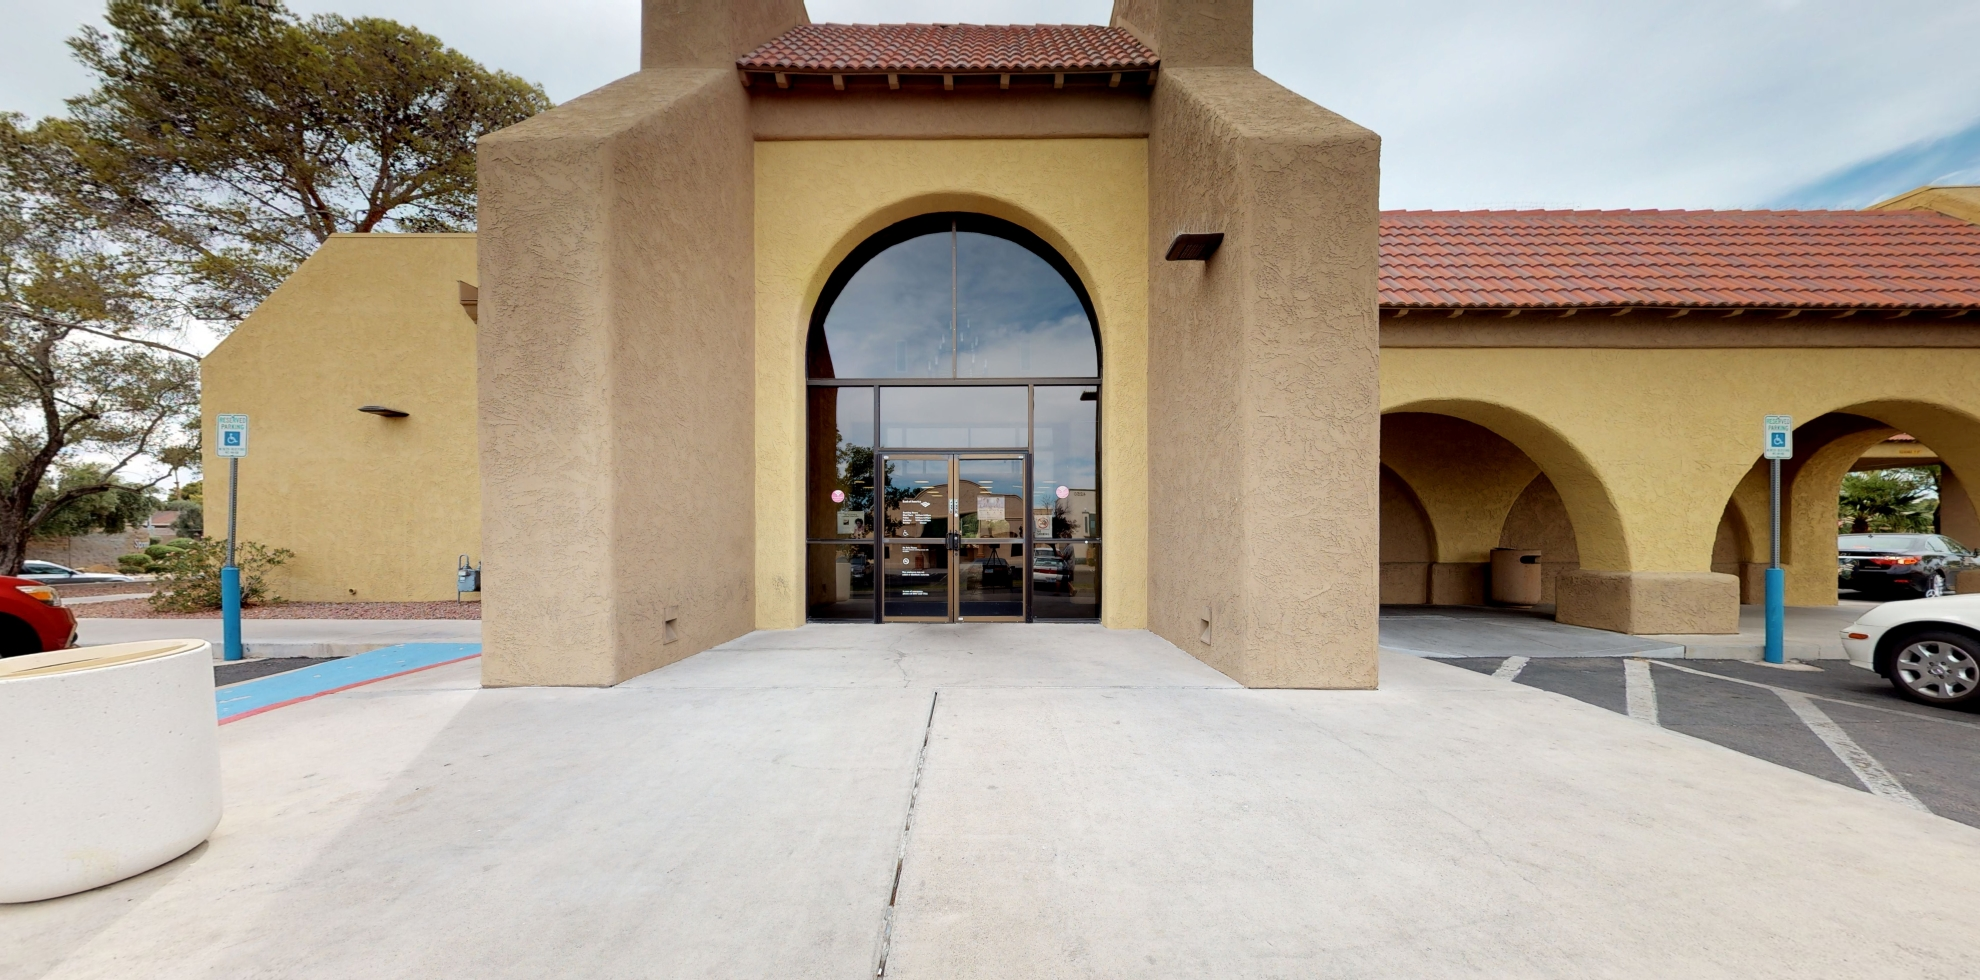 Bank of America financial center with drive-thru ATM | 4290 S Rainbow Blvd, Las Vegas, NV 89103